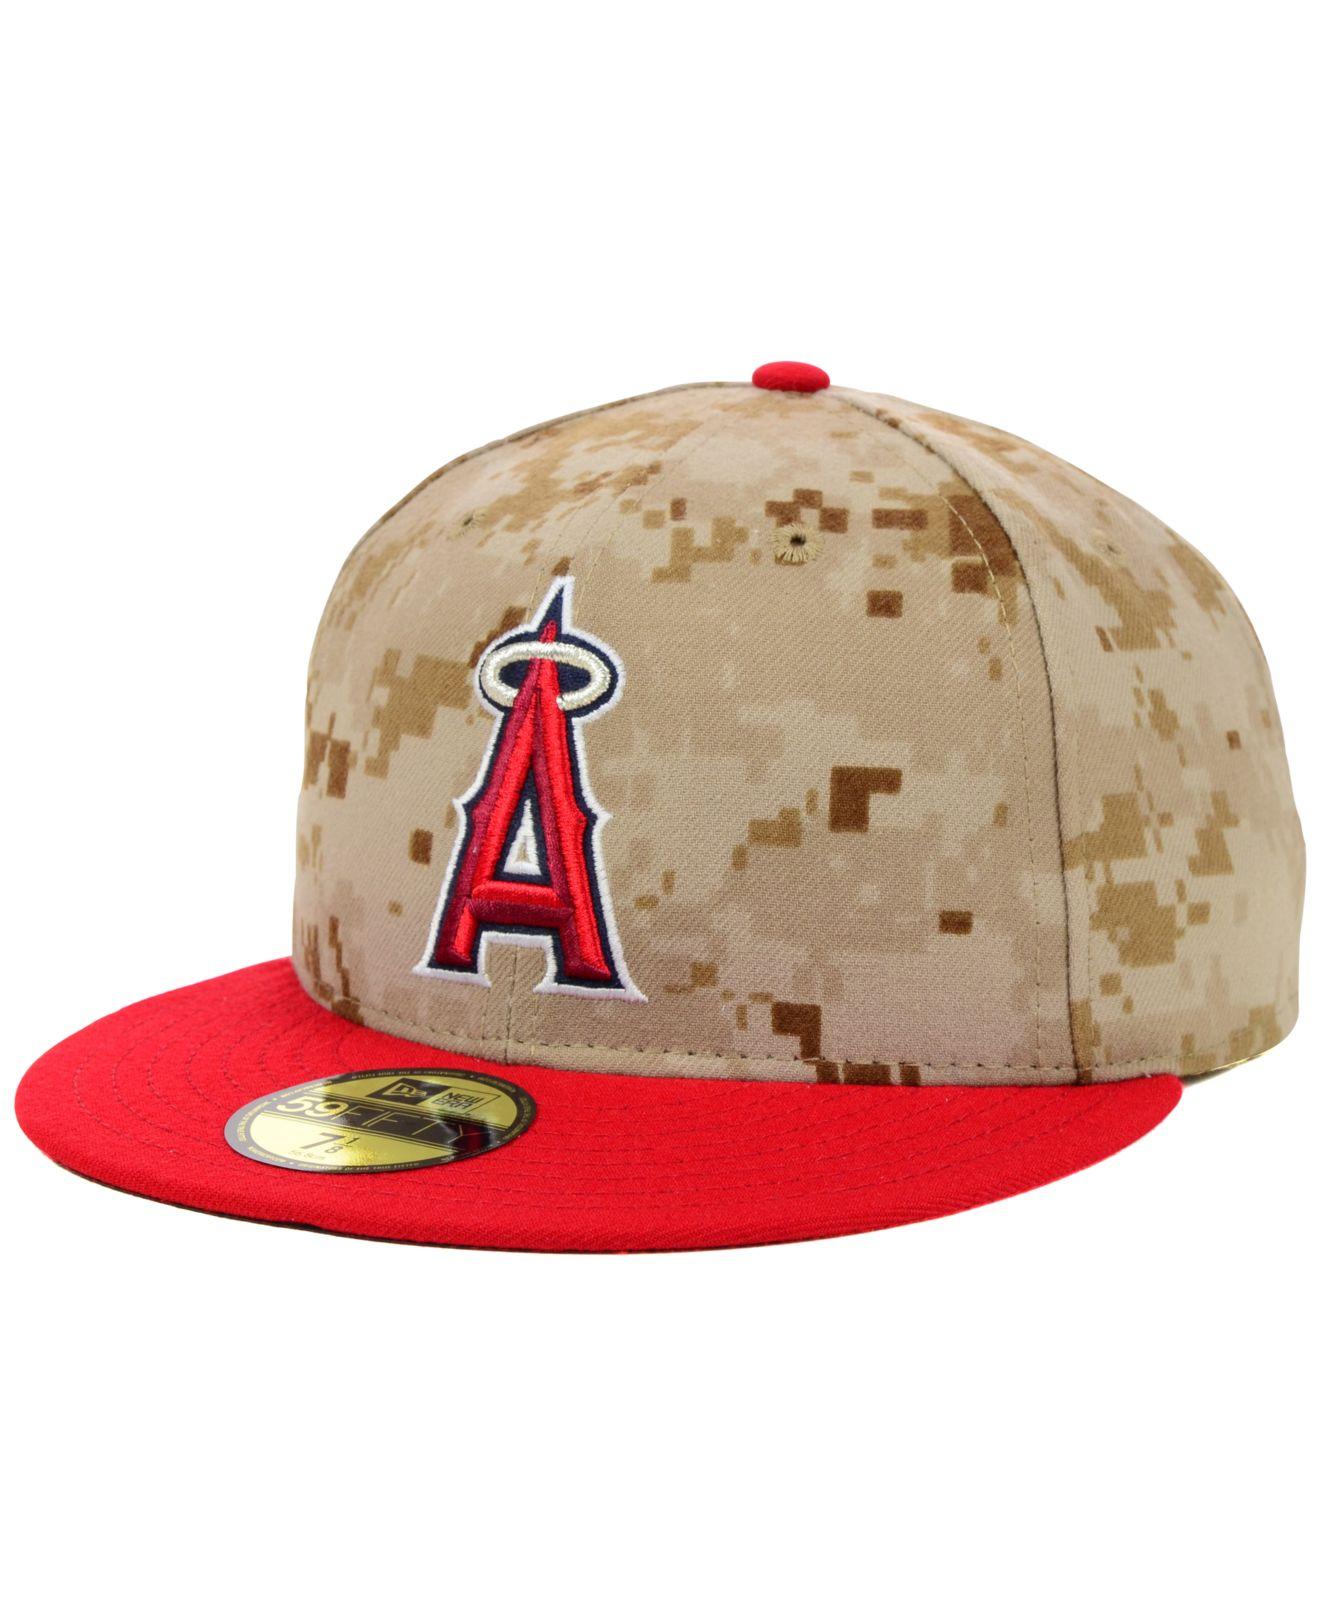 Lyst - KTZ Los Angeles Angels Of Anaheim 2014 Stars And Stripes ... 329c92c5fe24